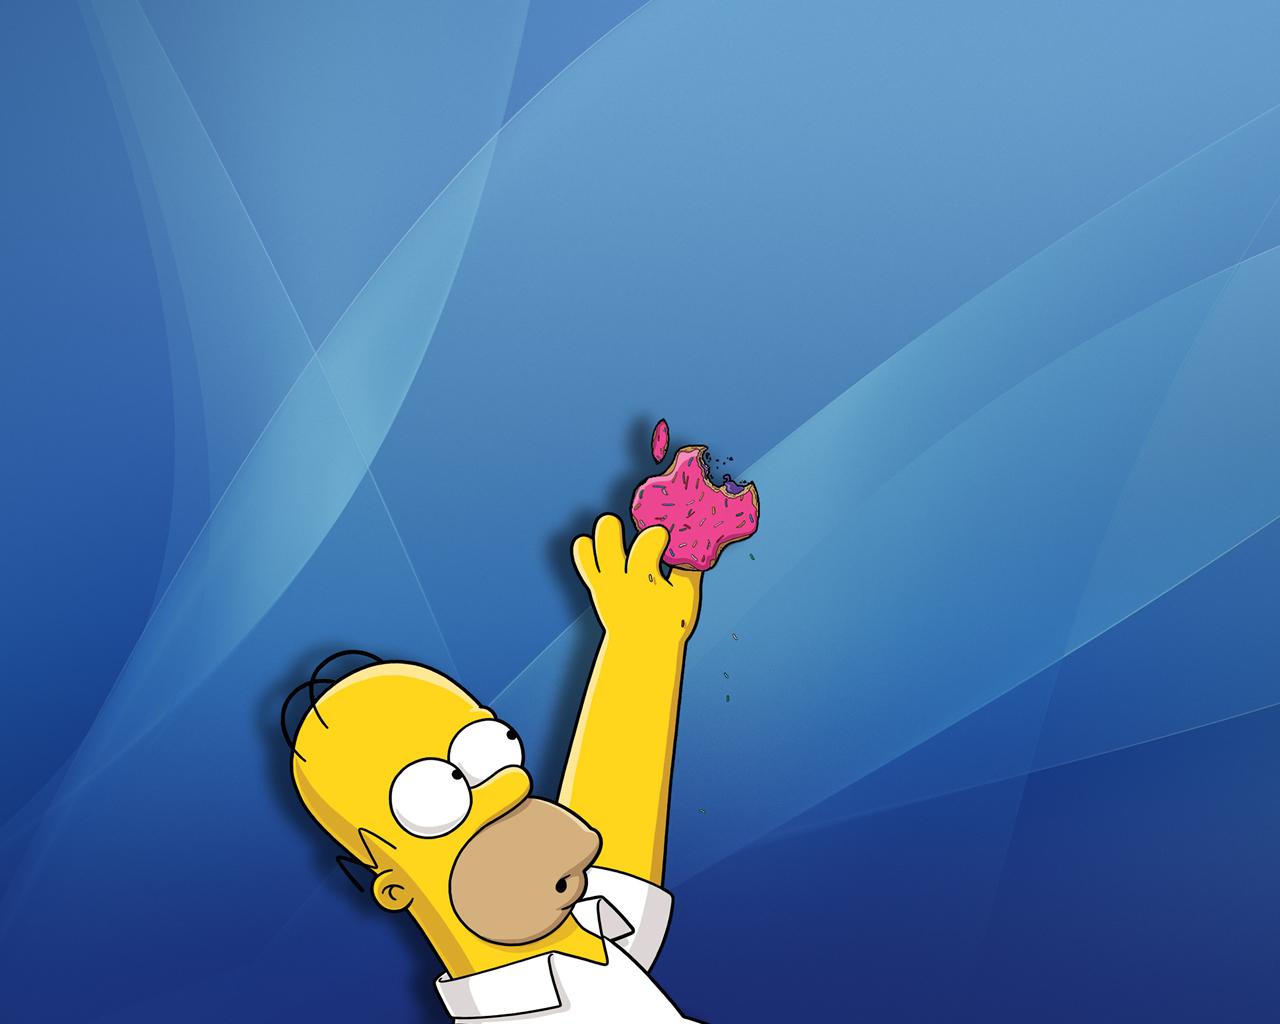 Simpson and apple desktop wallpapers 1280x1024